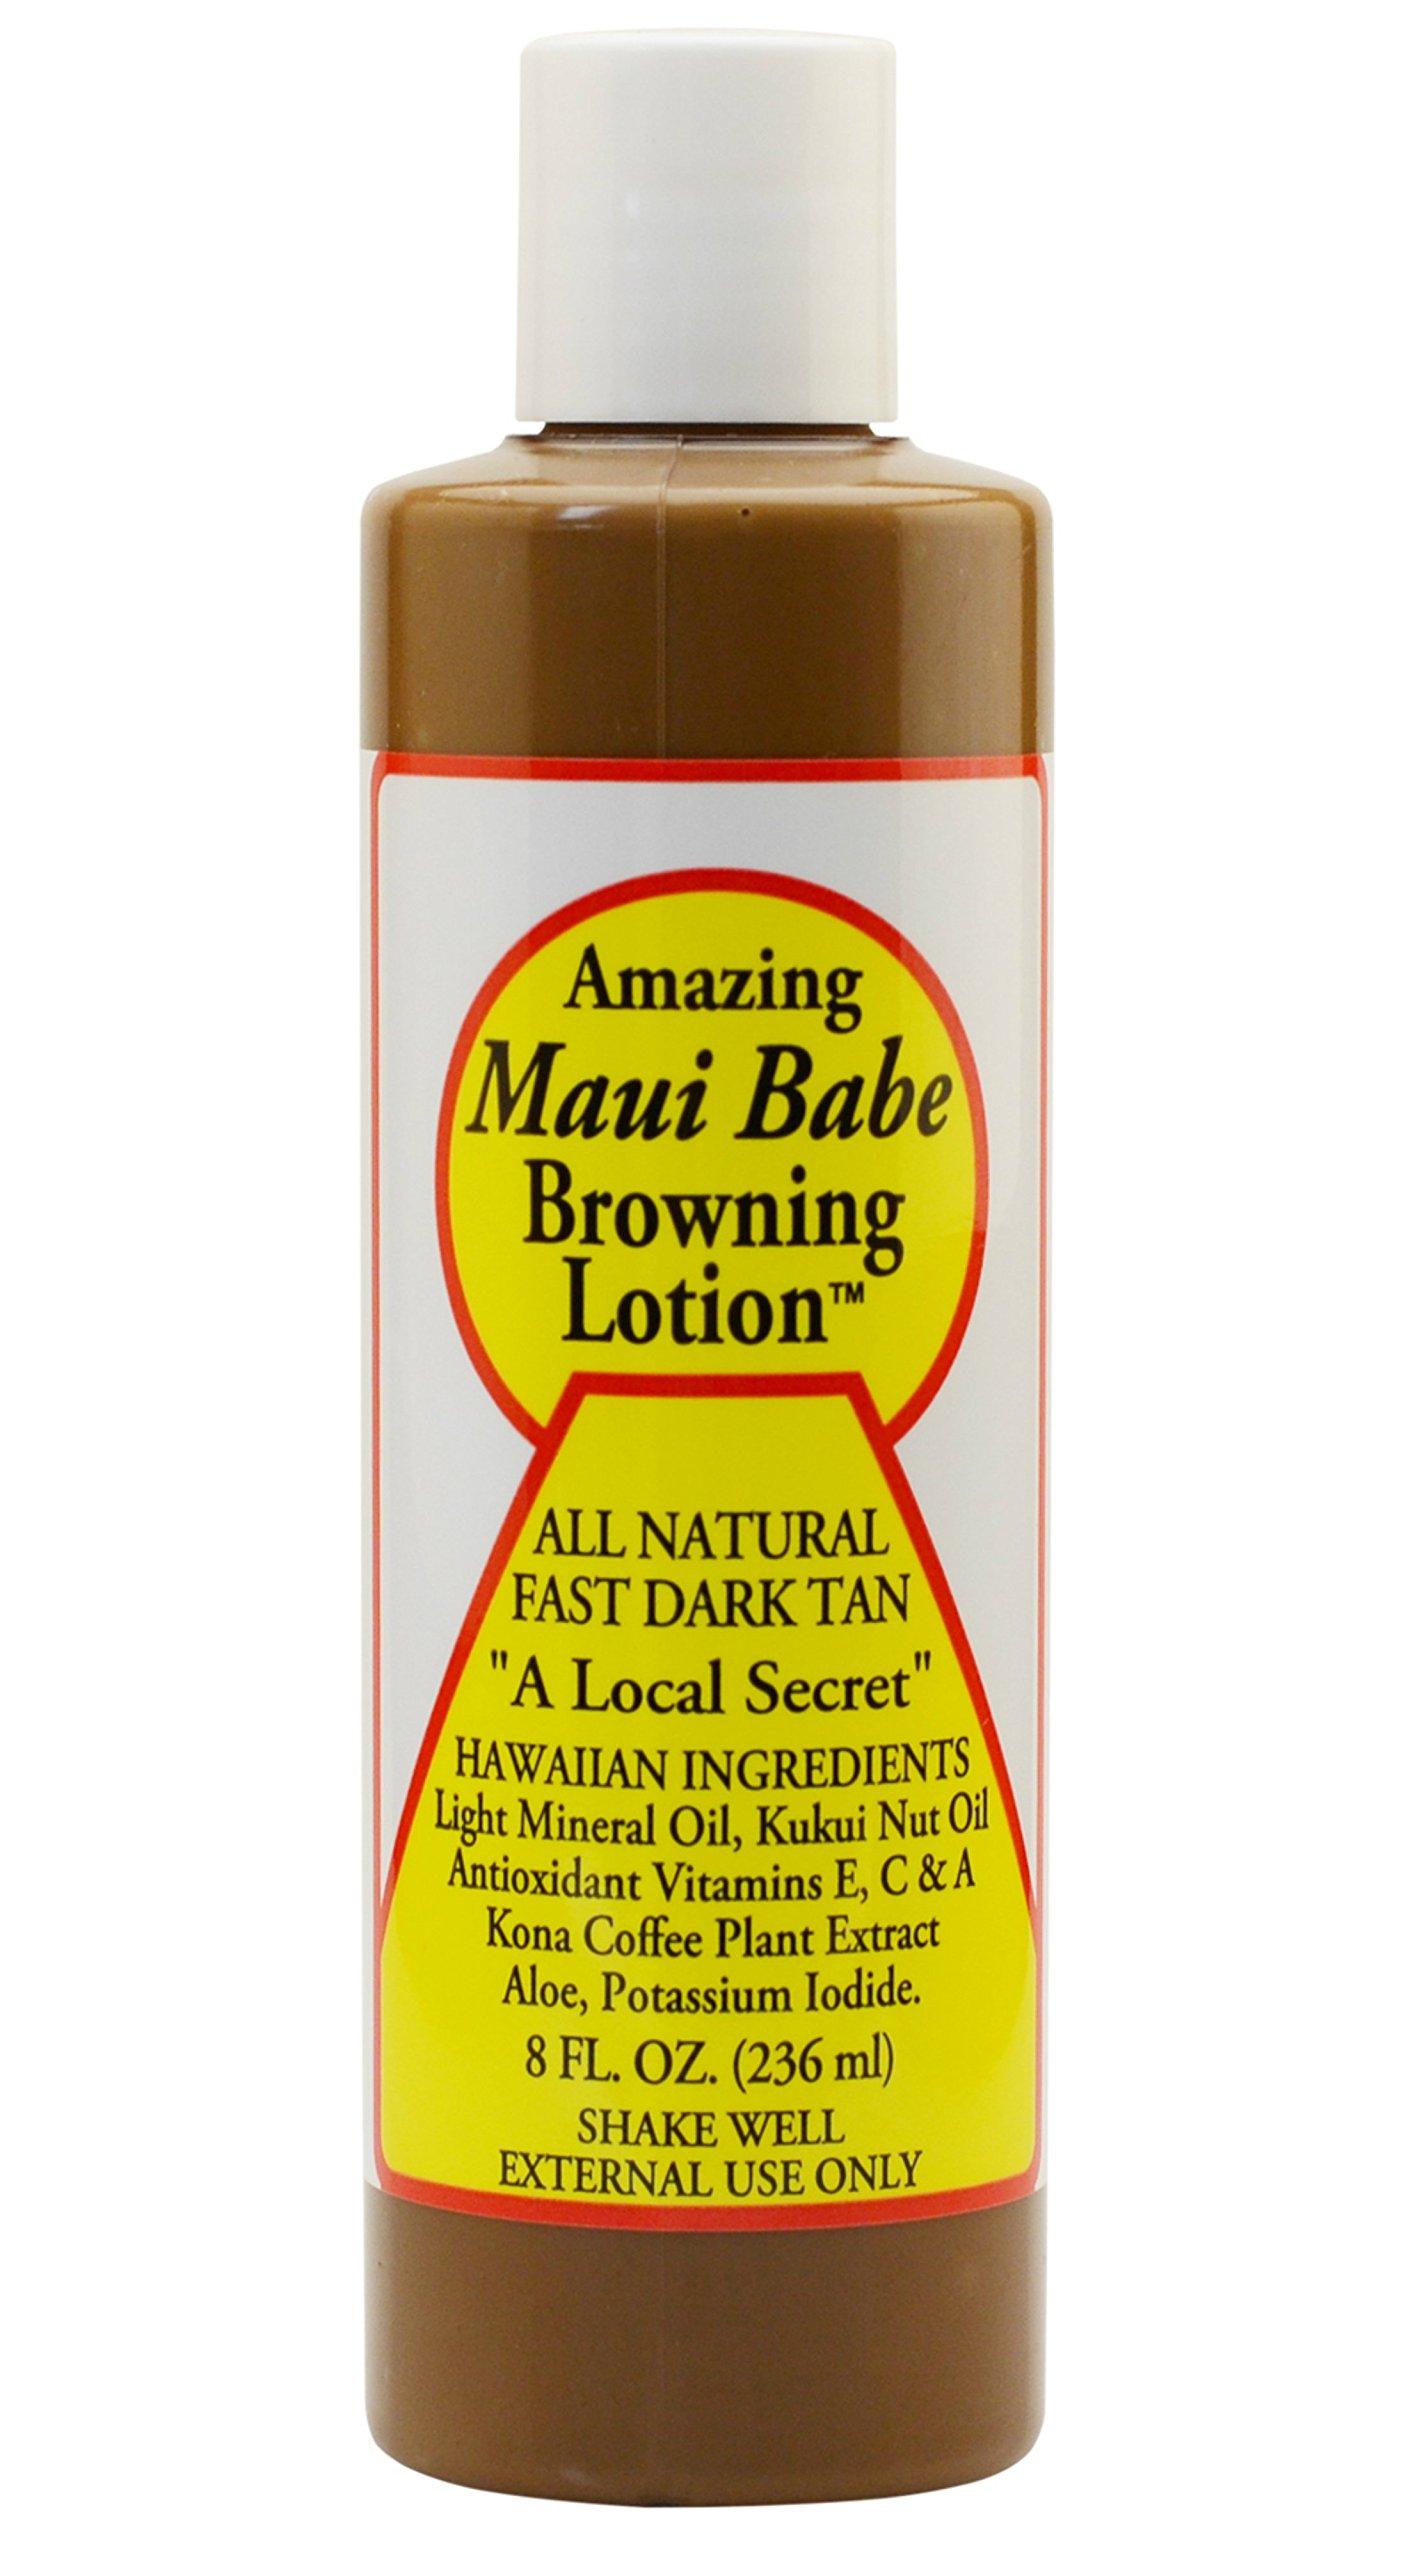 Maui Babe Variety Beach Pack (Browning Lotion 8 oz, After Browning Lotion 8 oz, and SPF 30 Sunblock 8 oz) by Maui Babe (Image #2)